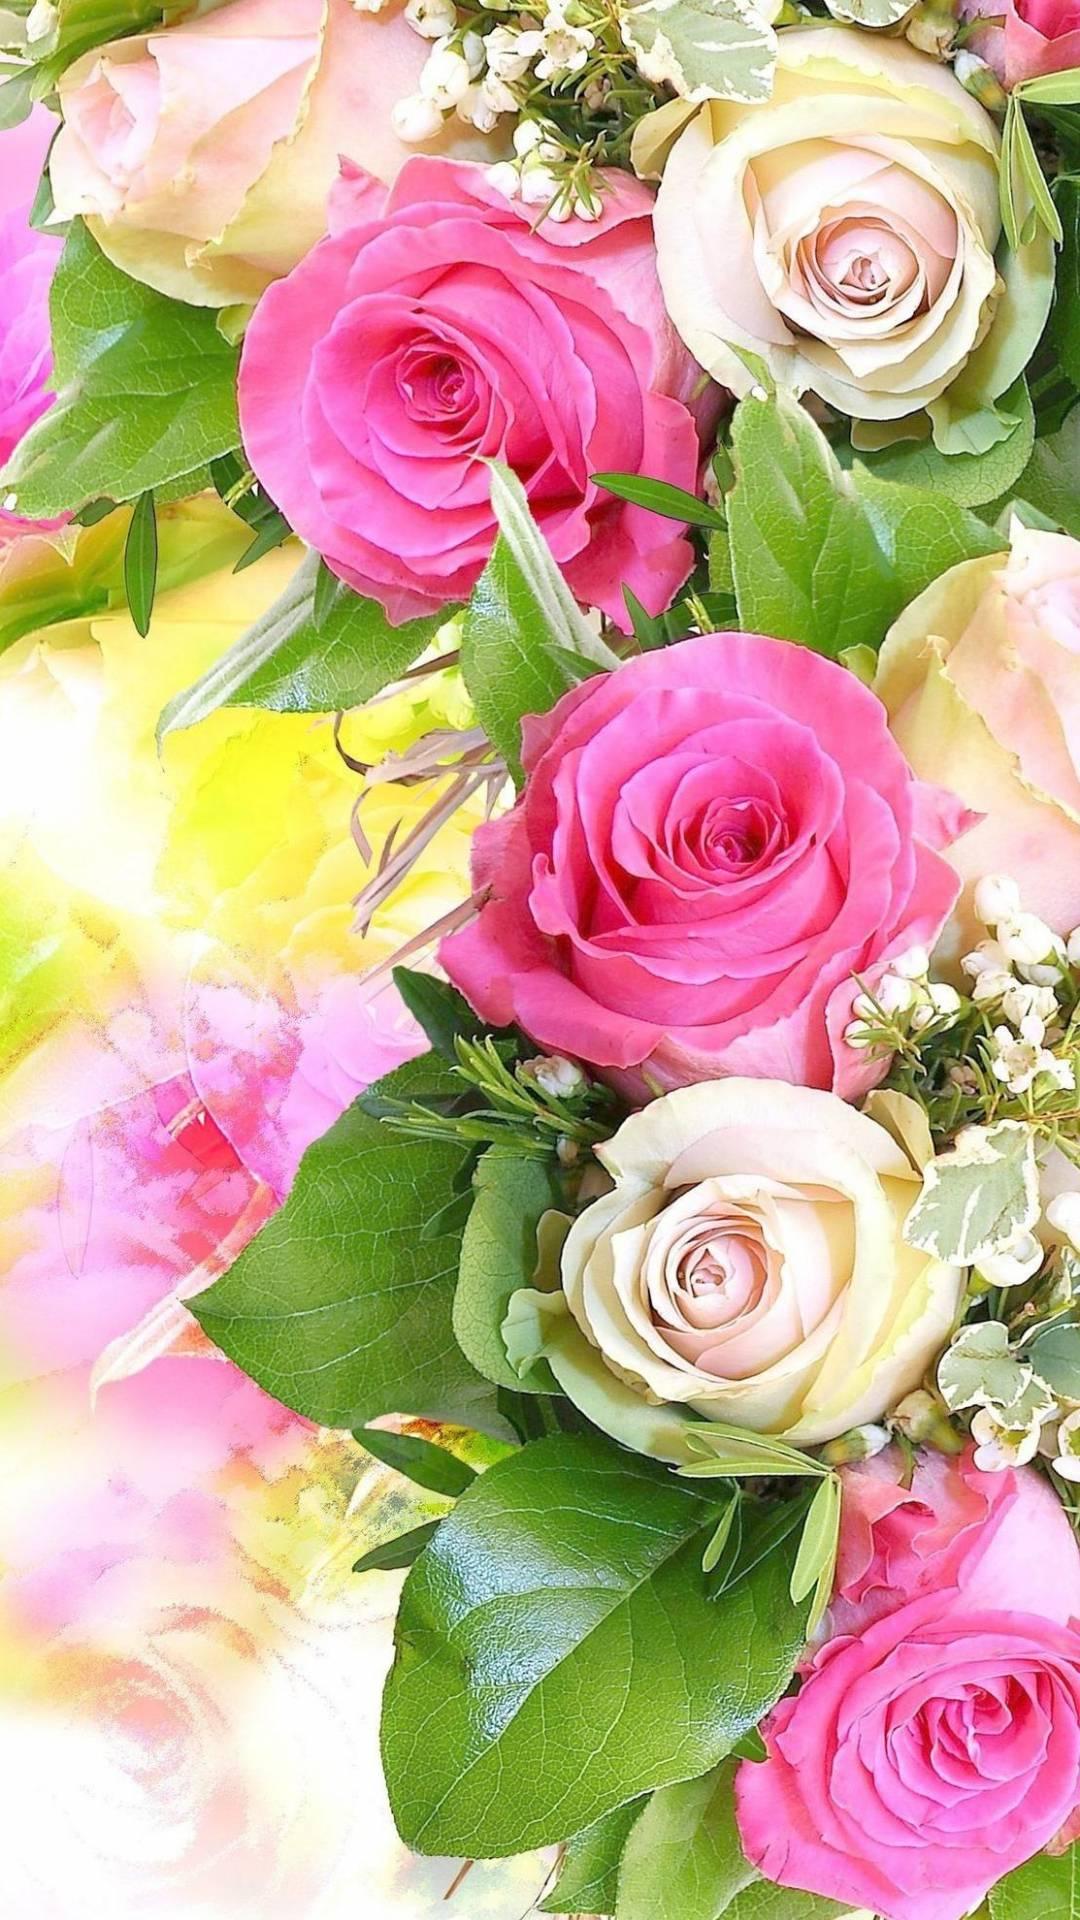 Flower Wallpaper, Floral, Rose Background Rosely